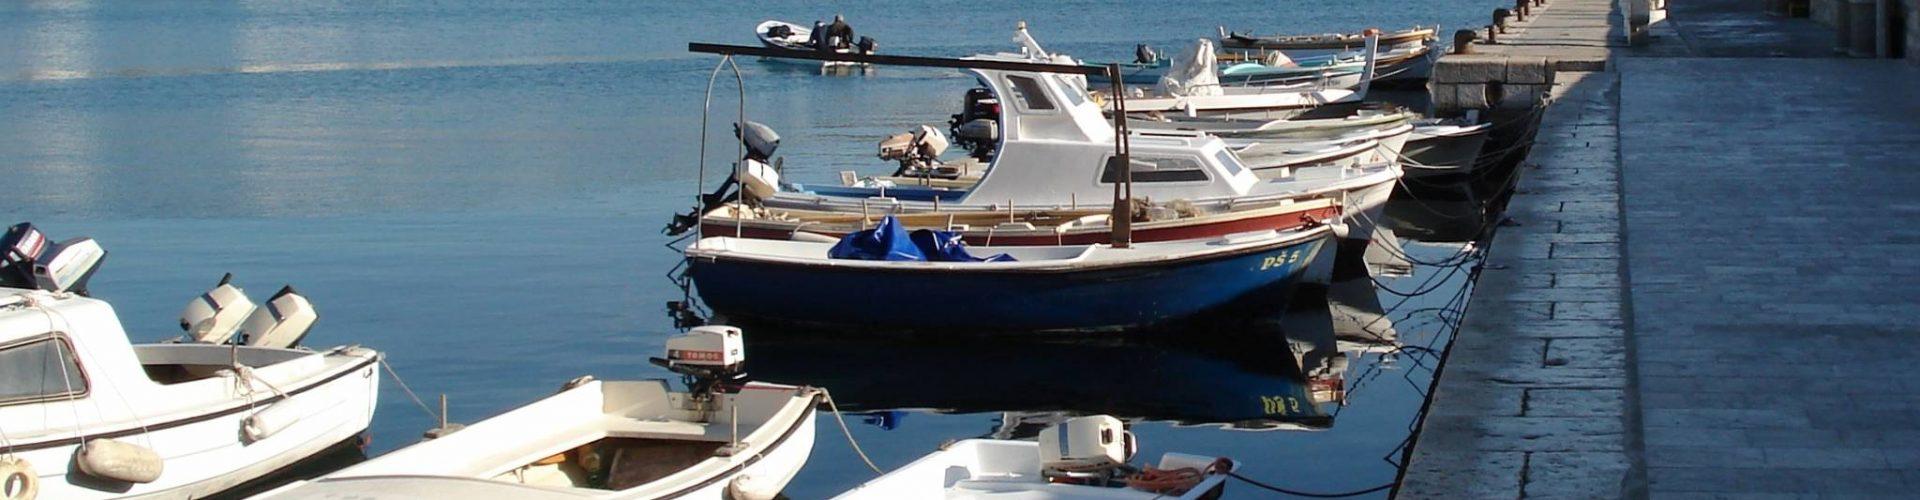 holidays-dalmatia team, About us